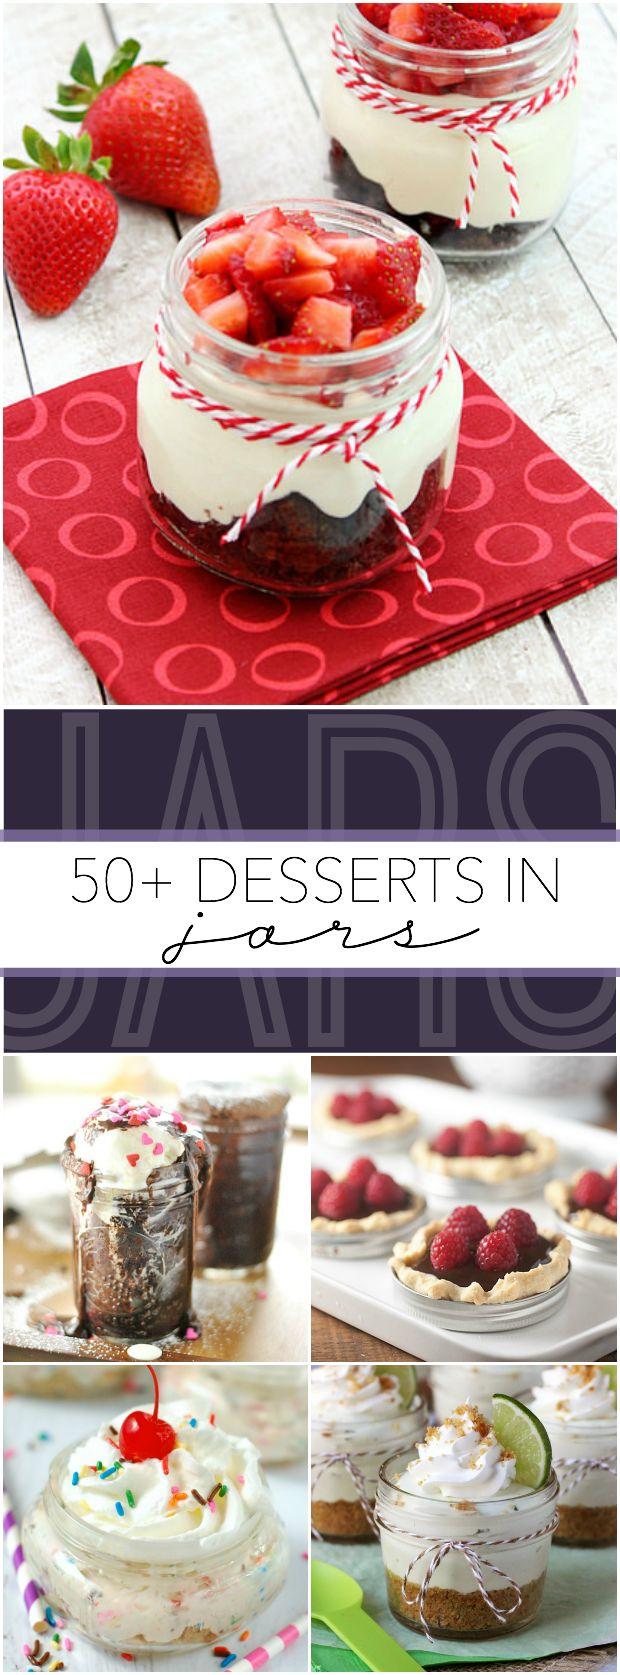 50+ Desserts in Jars